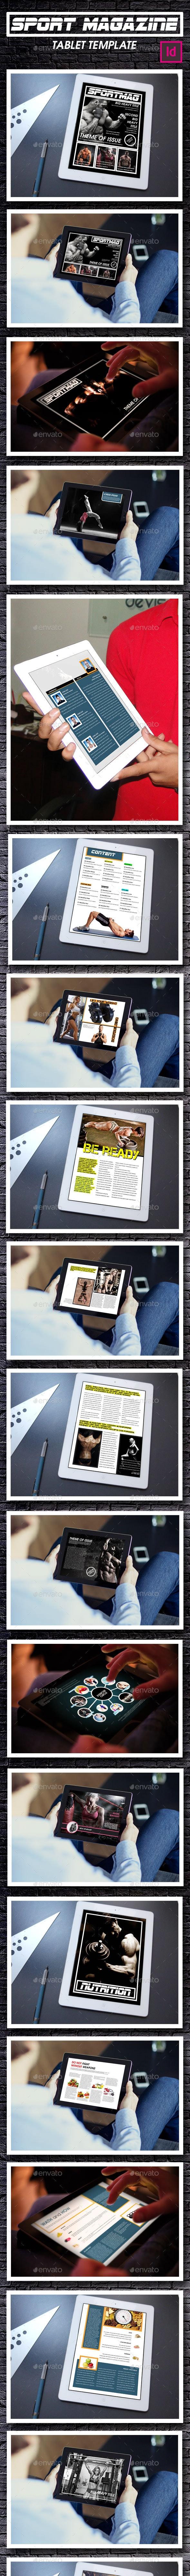 Tablet Sport Magazine Template - Digital Magazines ePublishing